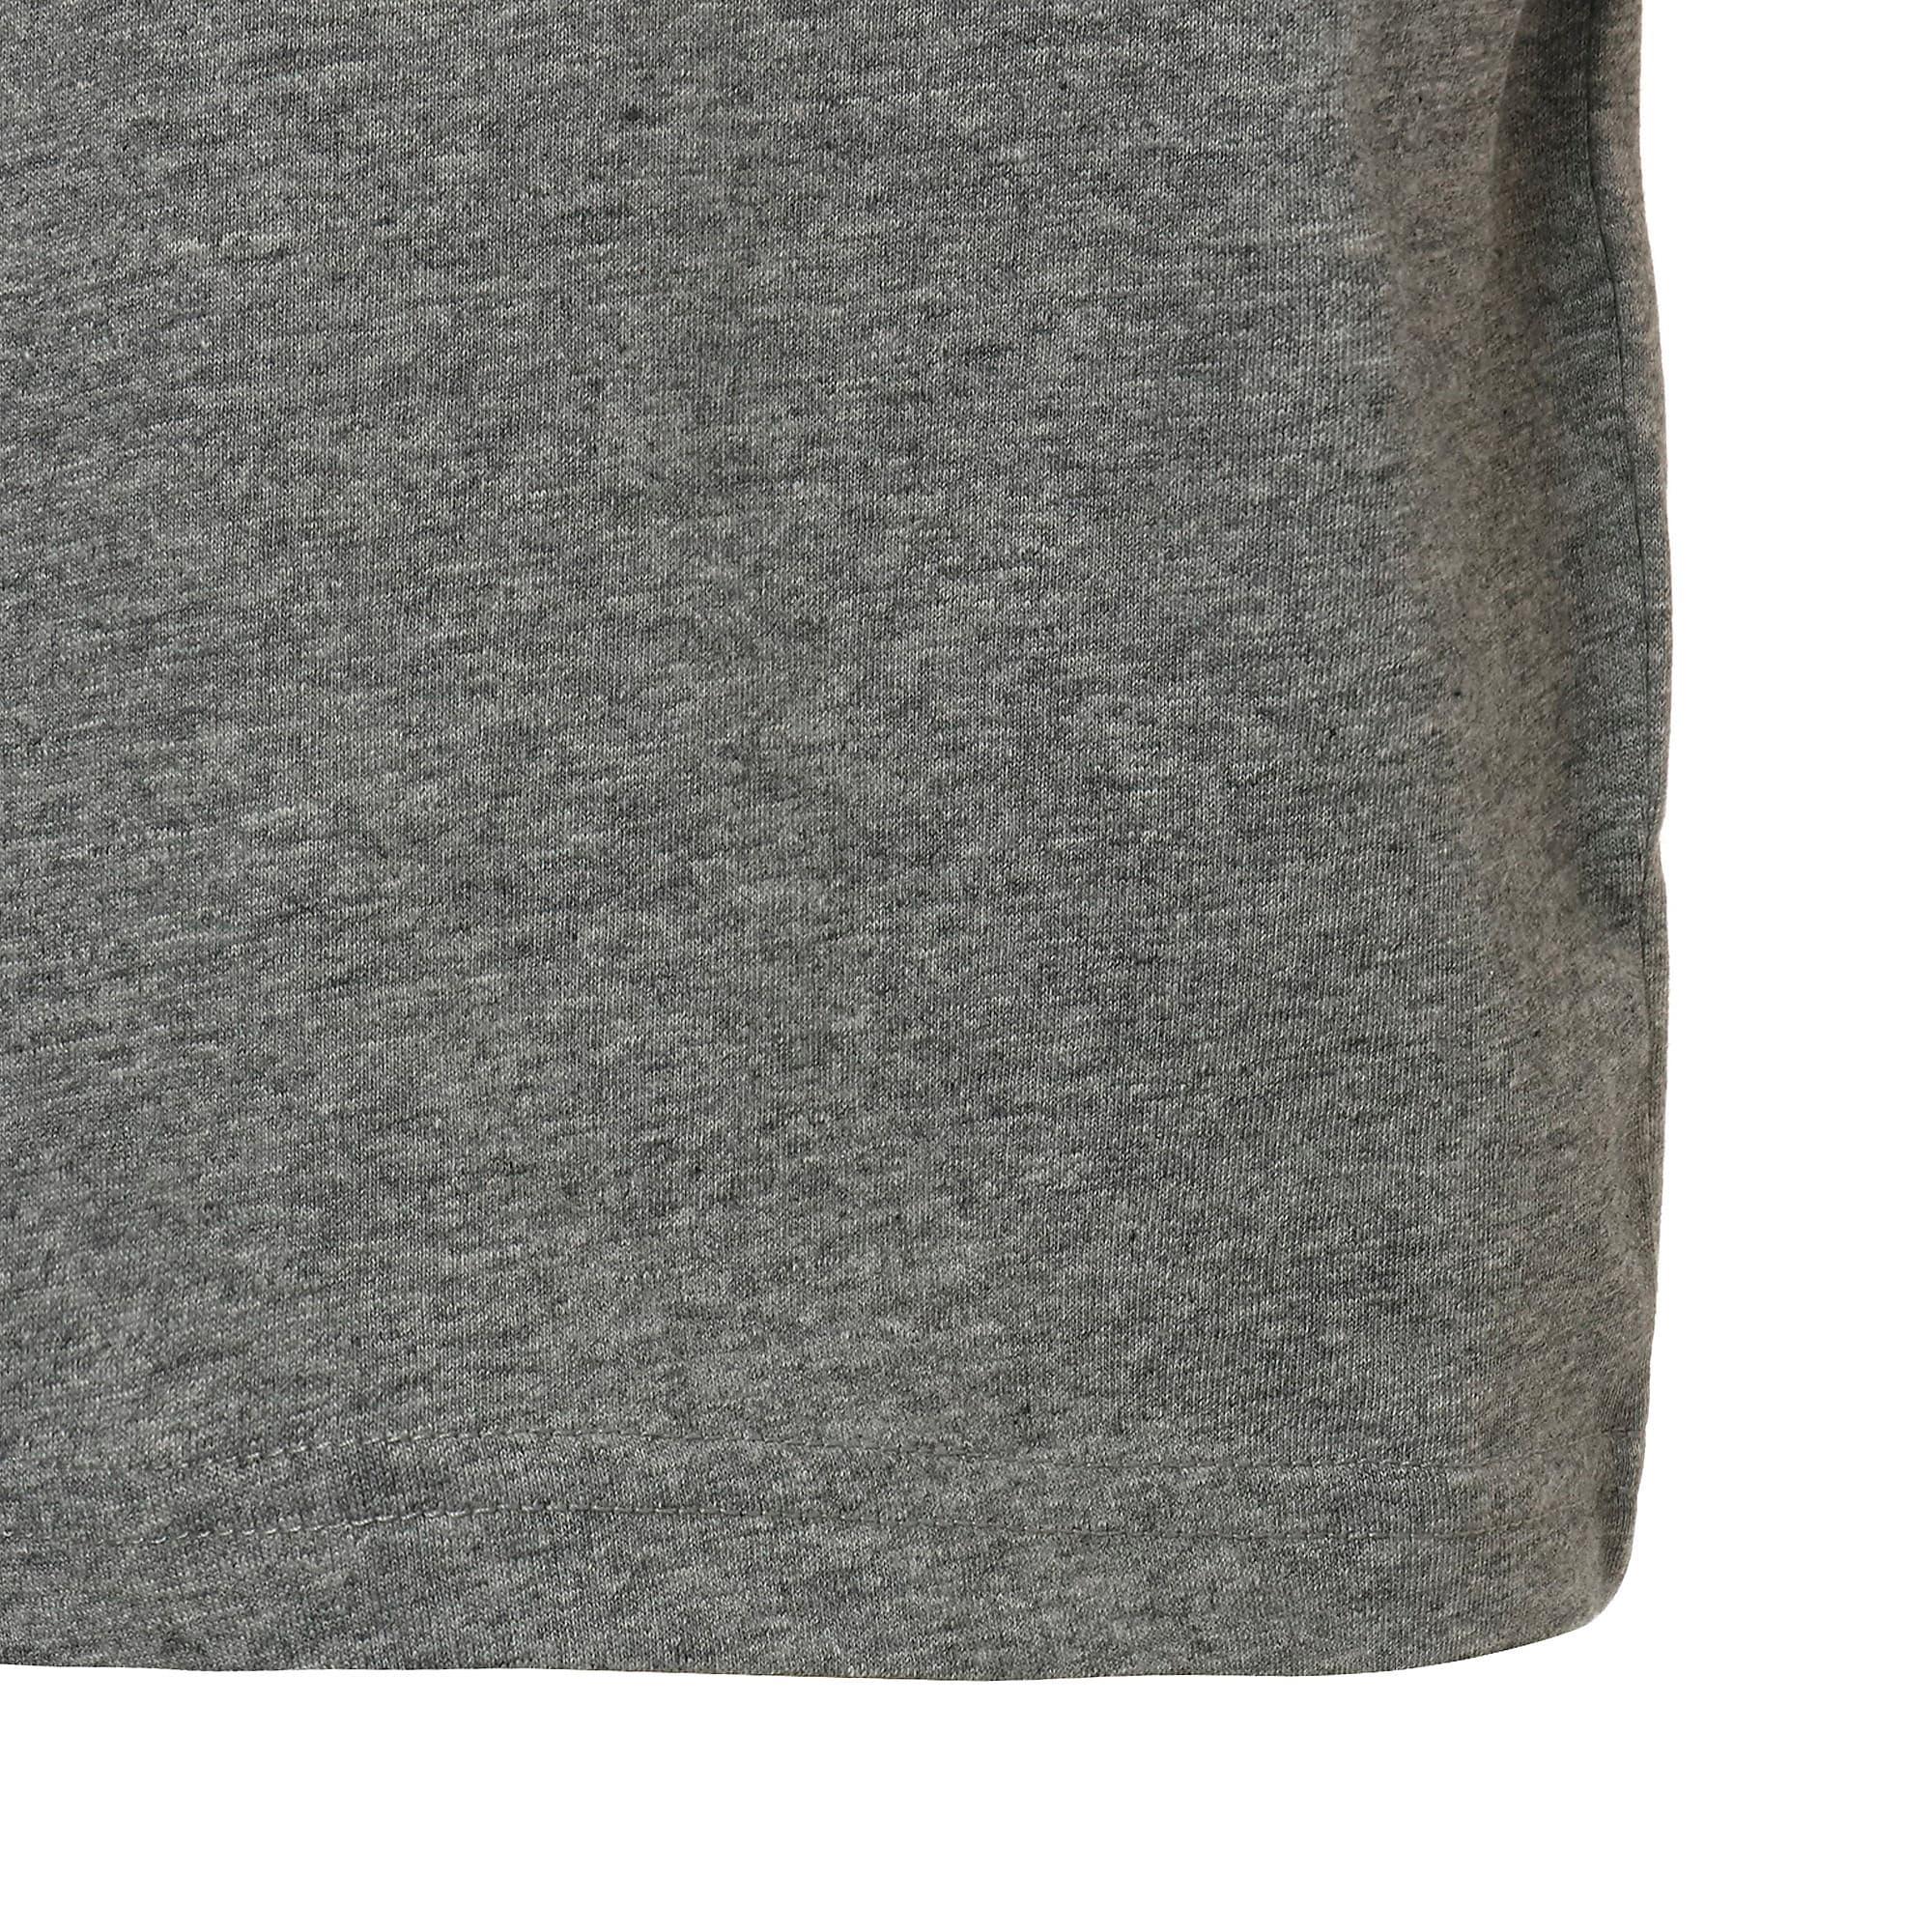 Thumbnail 6 of キッズ ALPHA SS グラフィック Tシャツ 半袖, Medium Gray Heather, medium-JPN